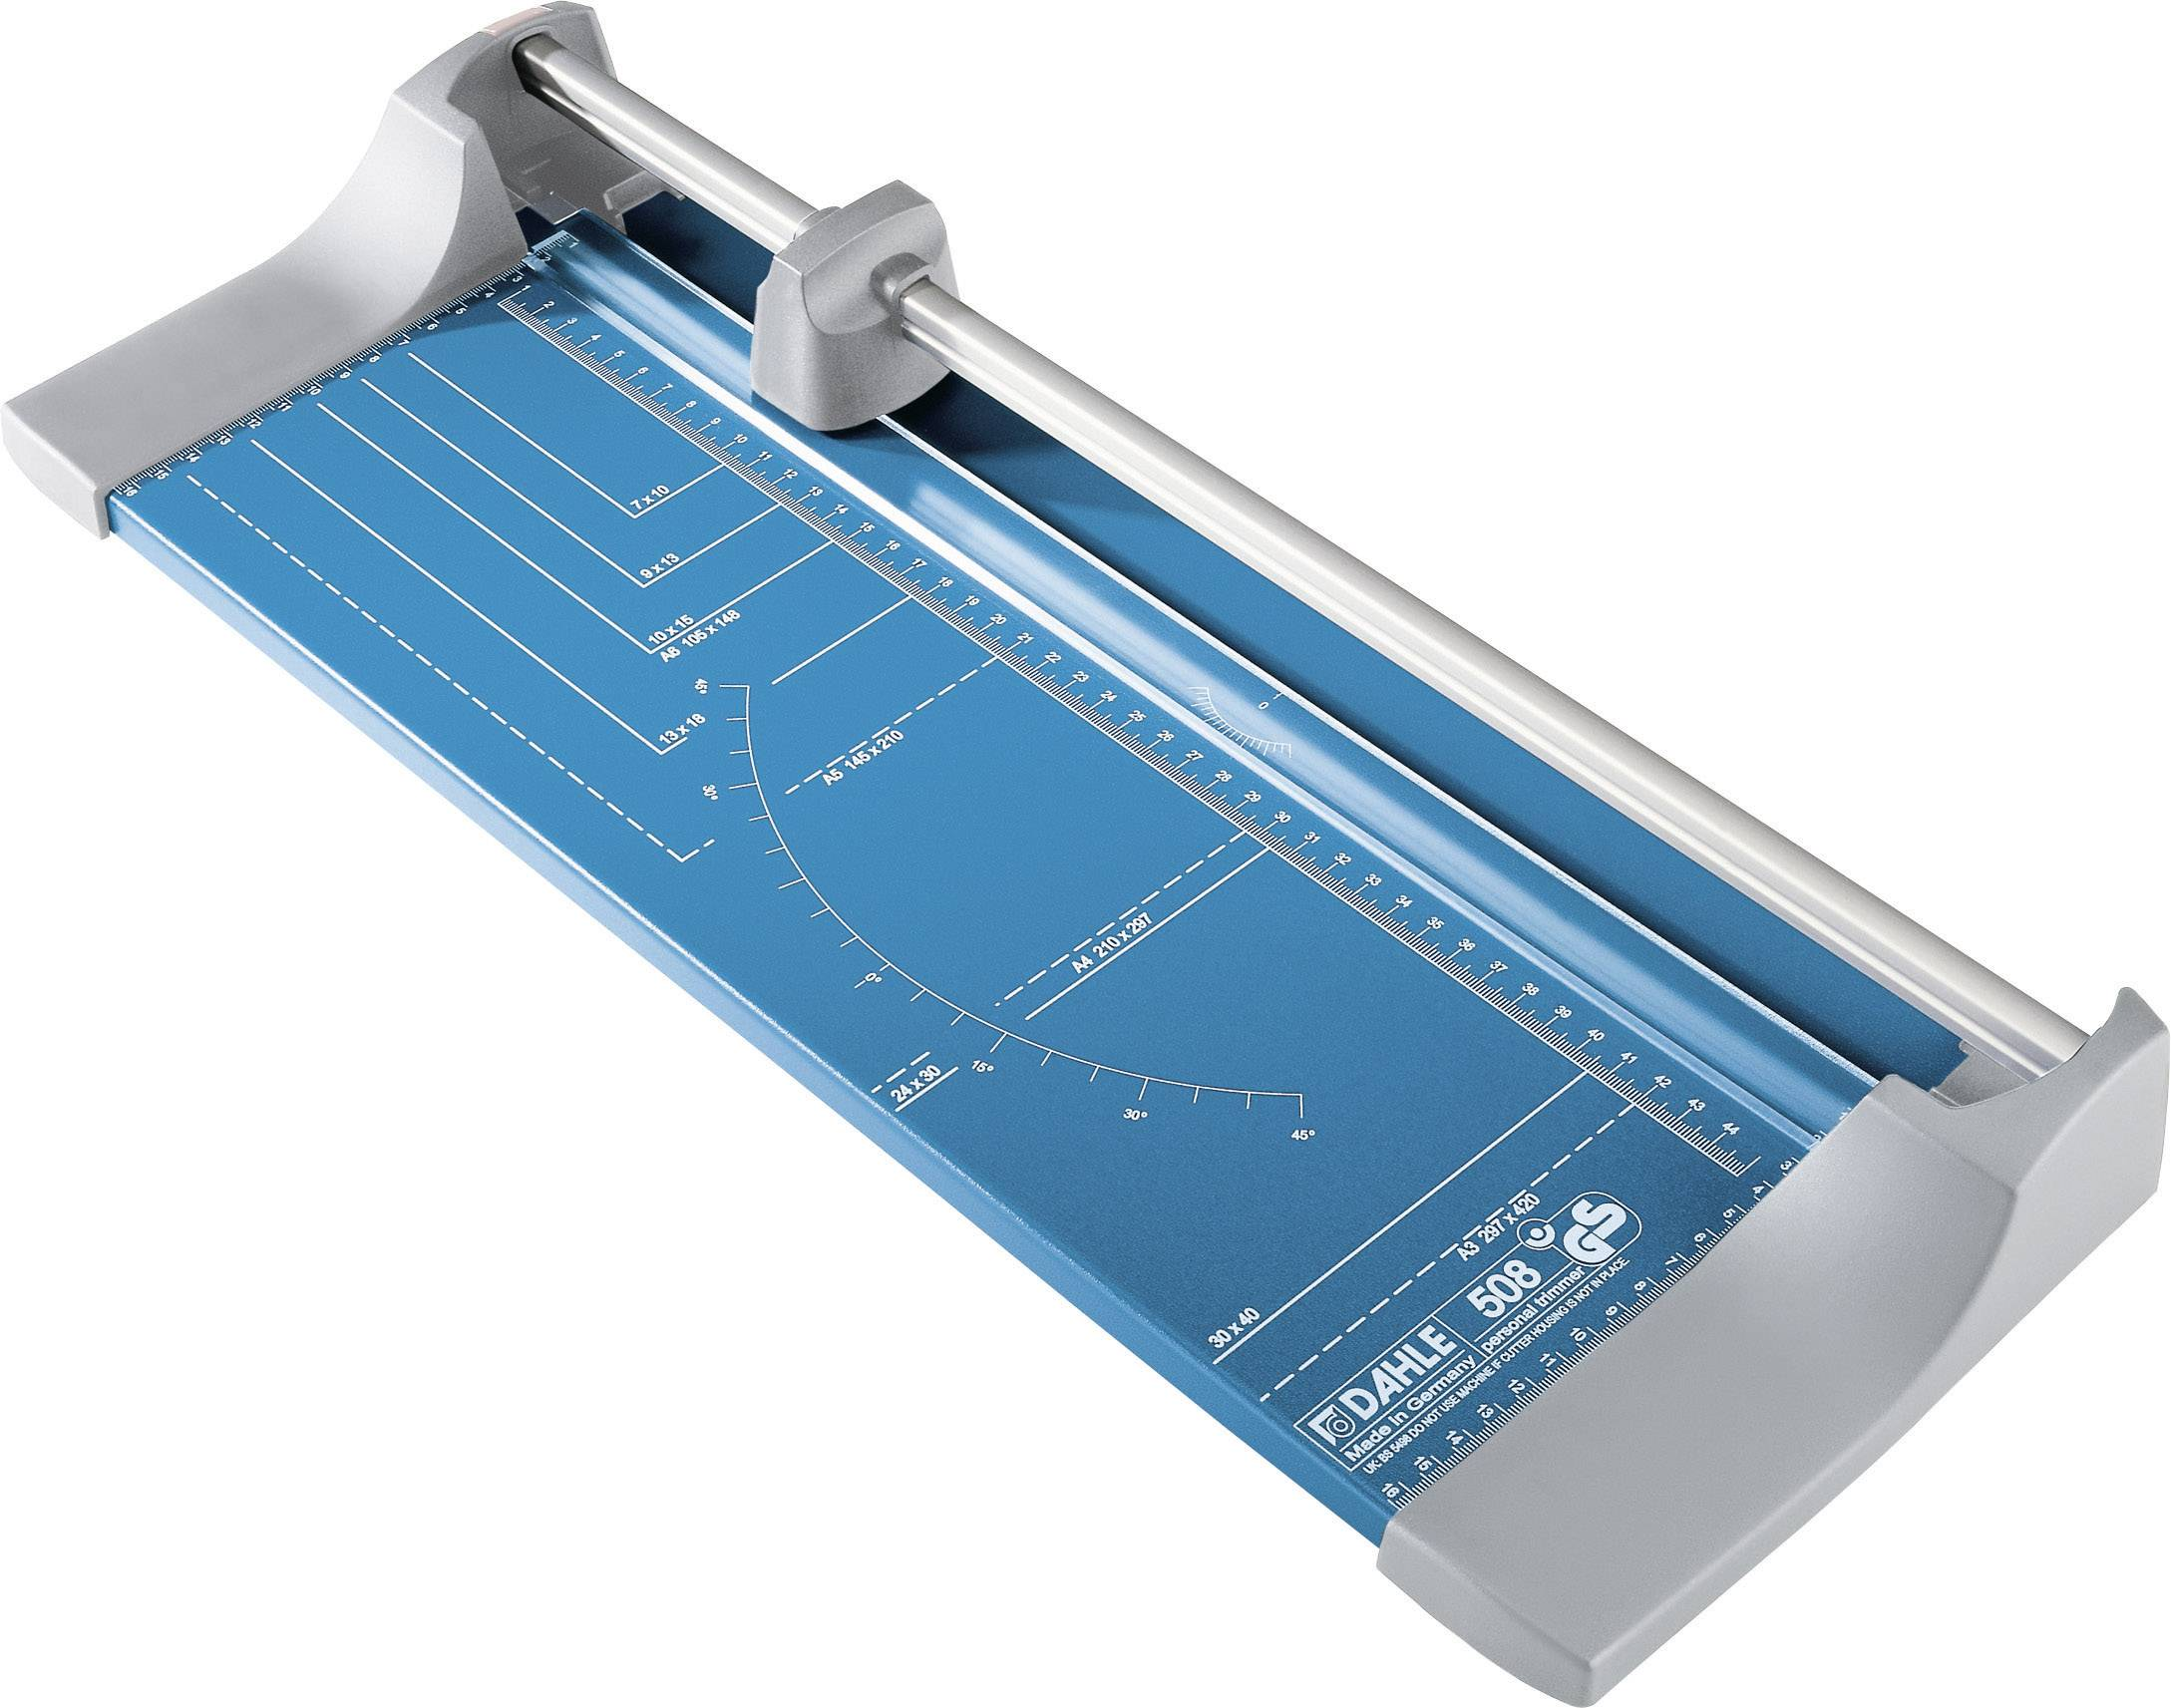 DAHLE® Hebel-Schneidemaschine 534 15 Blatt 460 mm blau